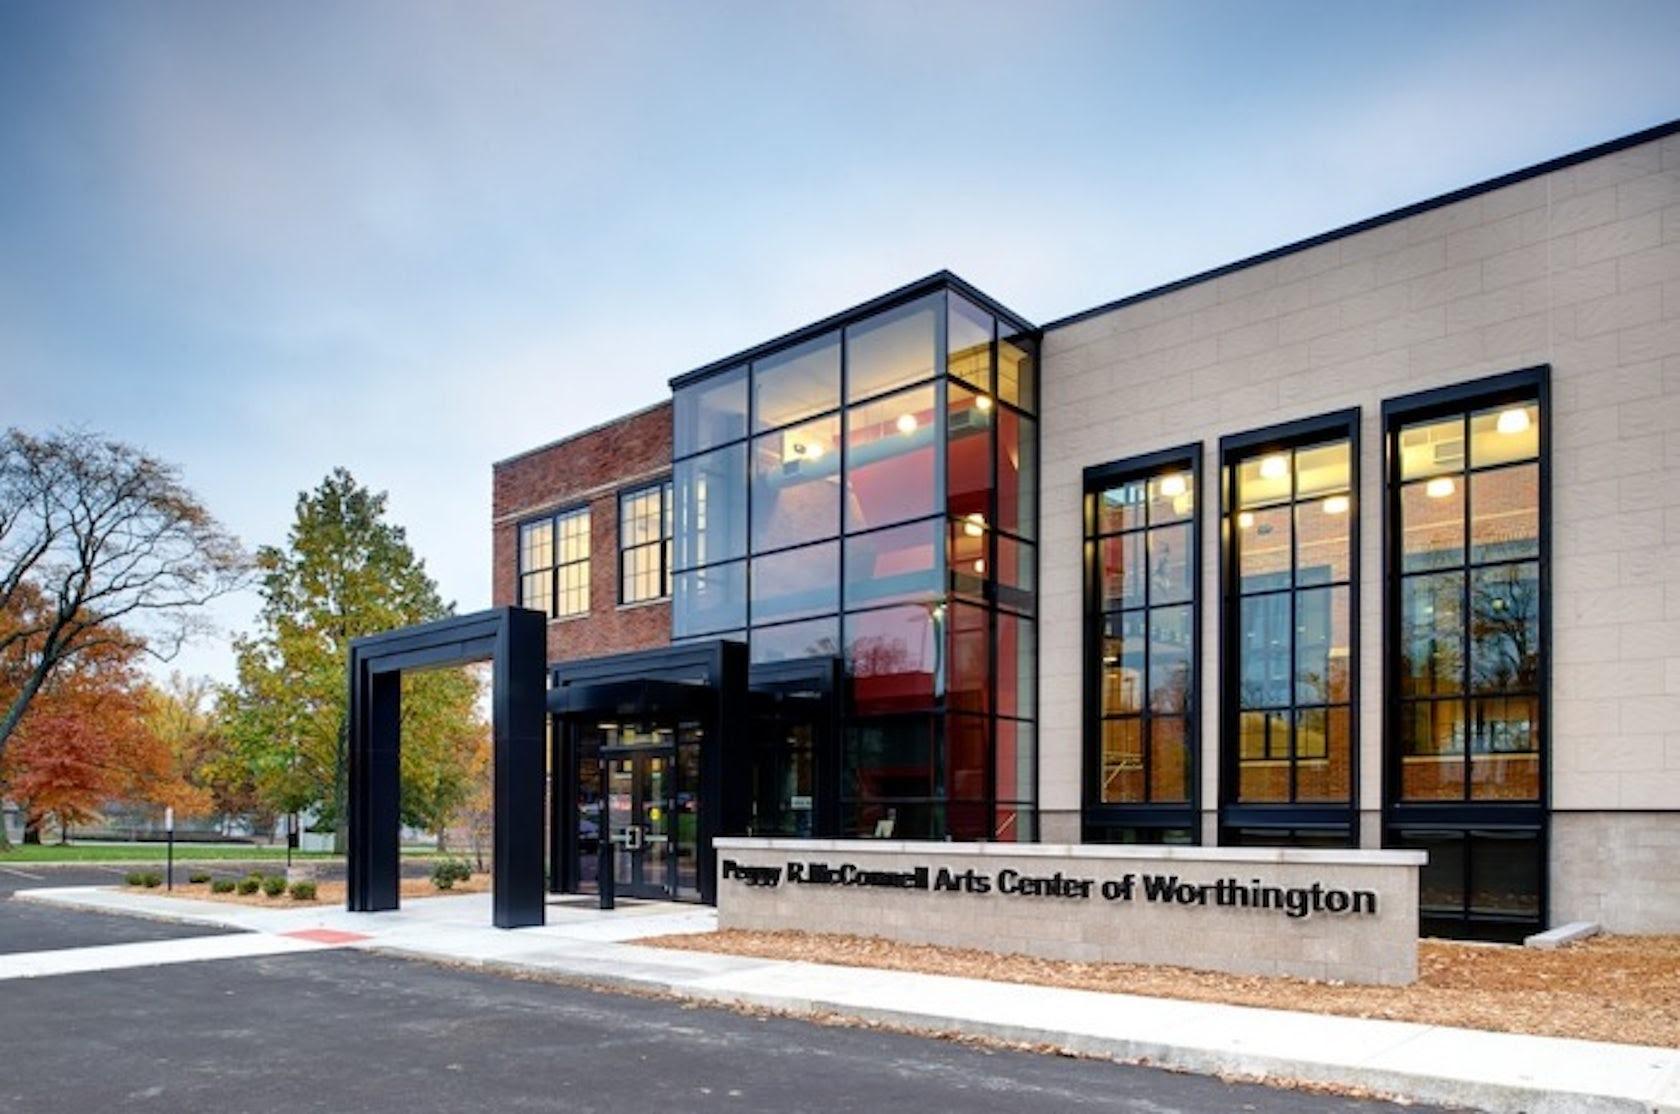 Worthington Arts Center by DesignGroup Inc - Architizer